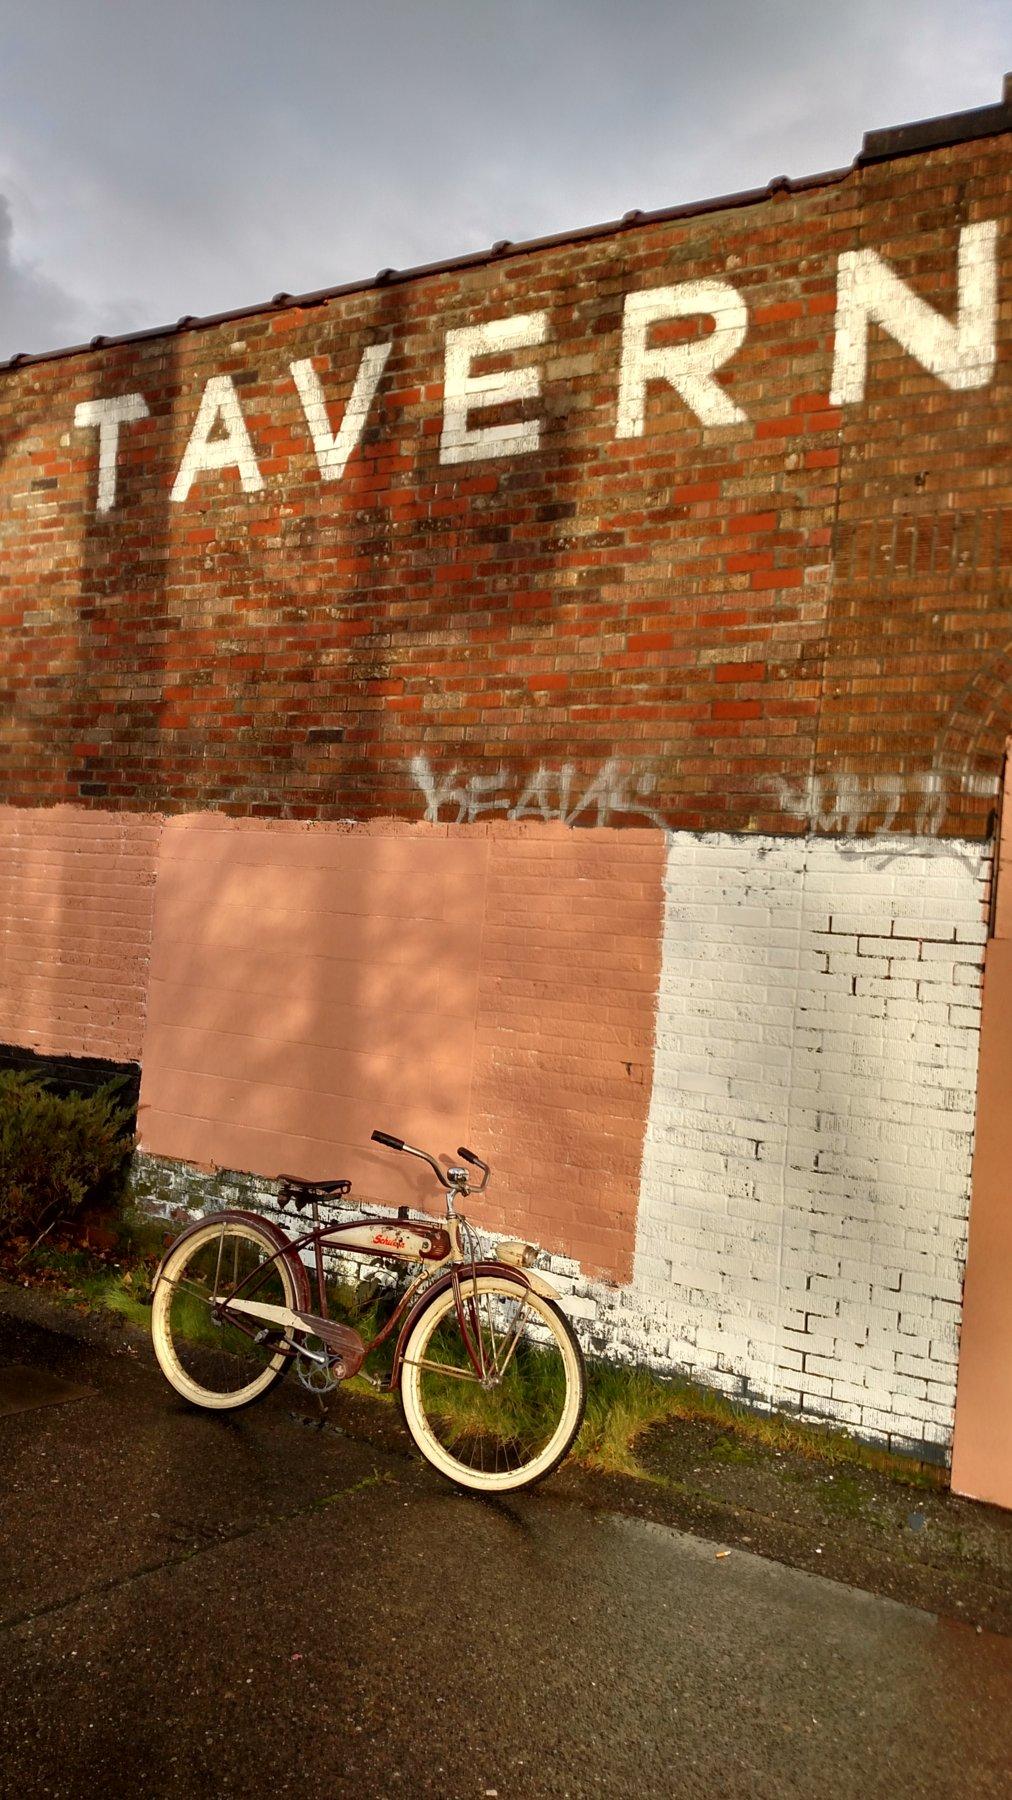 tavern bike.jpg